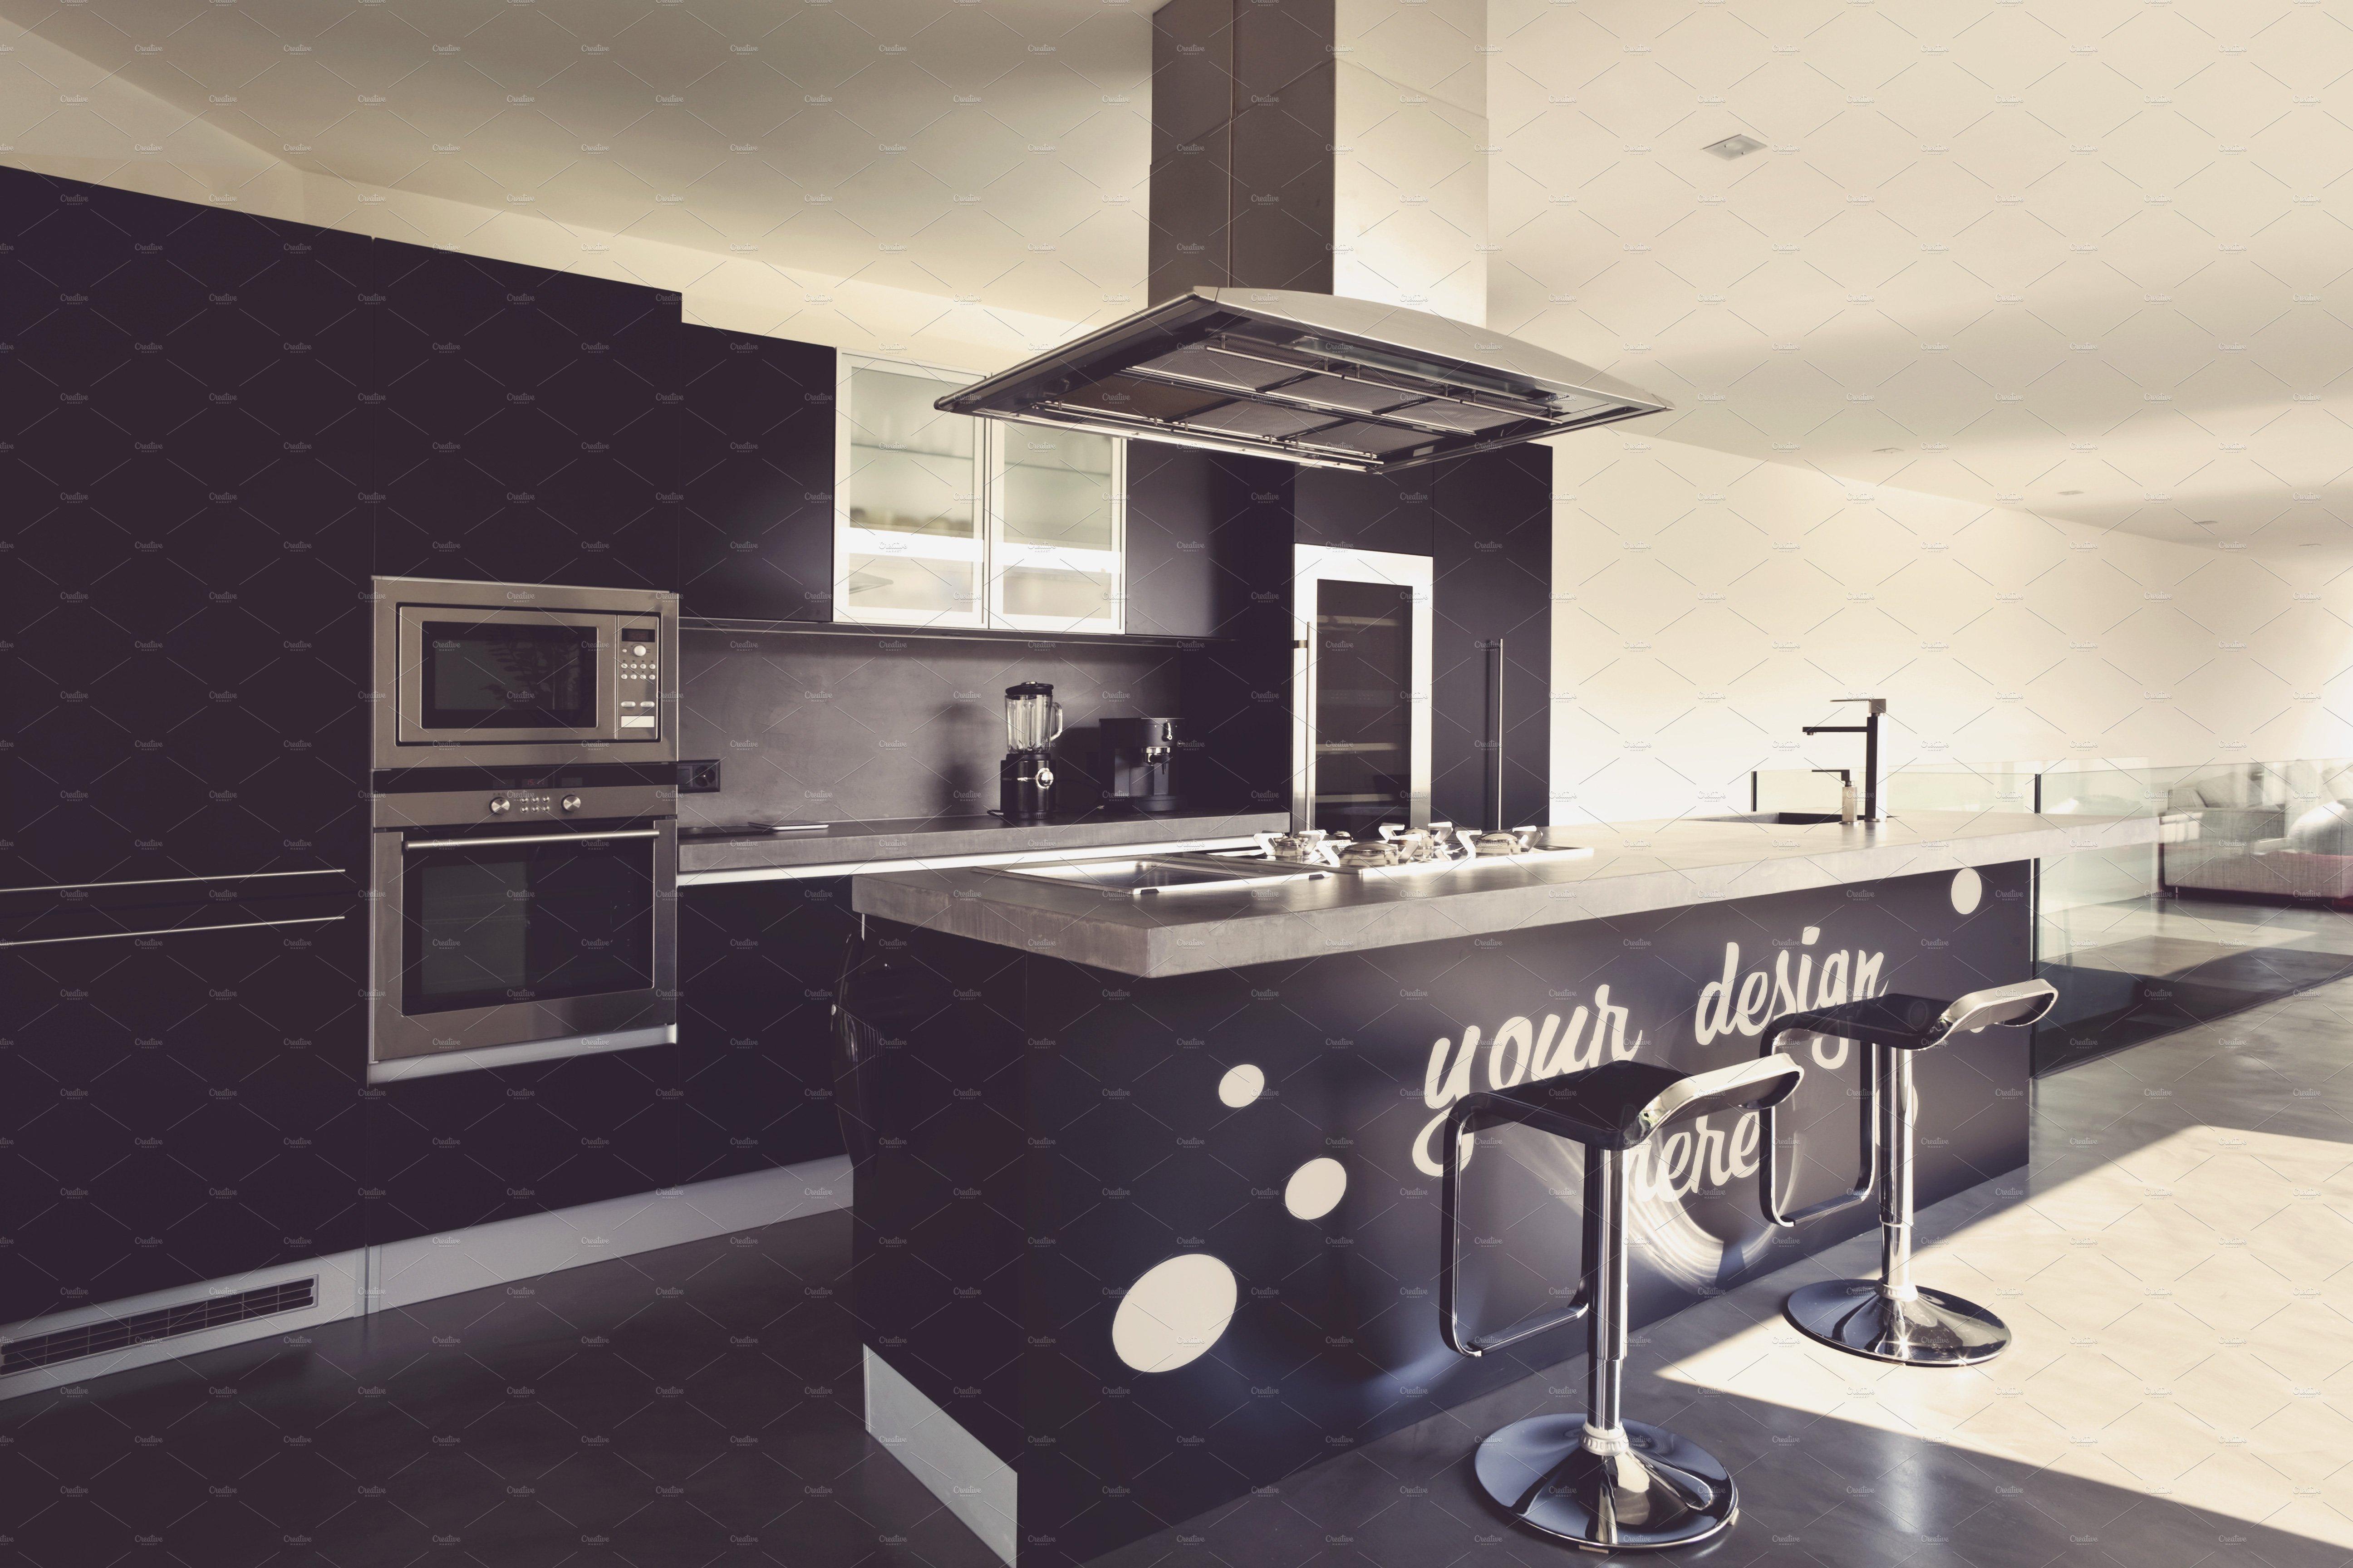 Kitchen mock up 1 product mockups creative market - Cuisine design petite surface ...